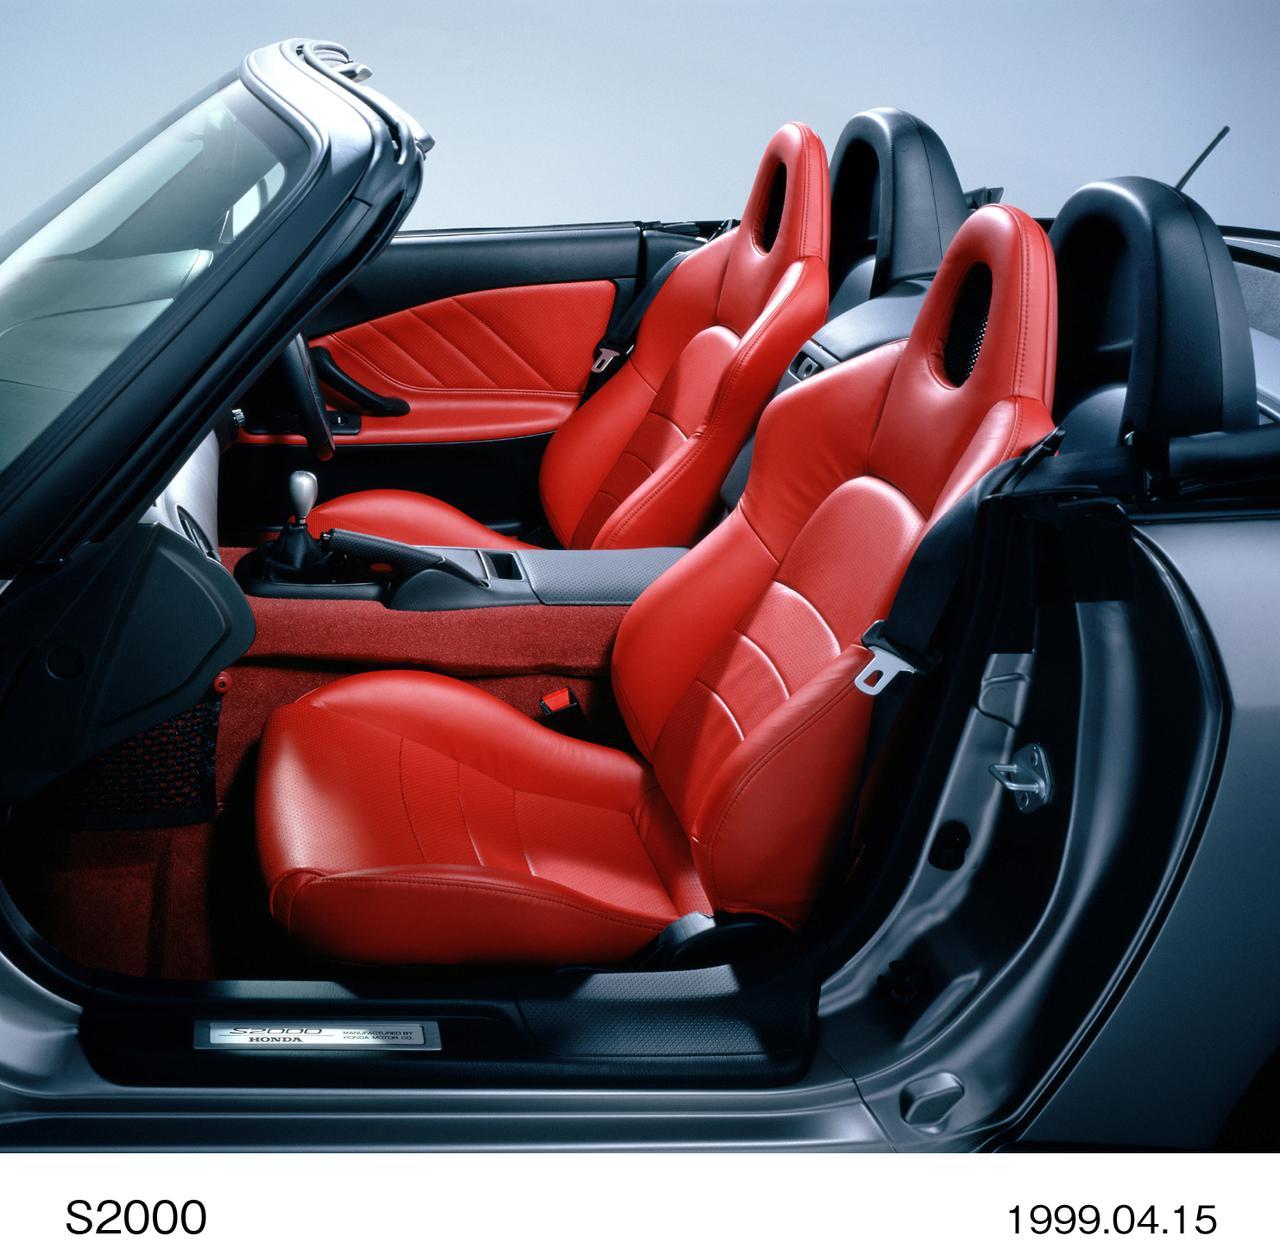 Images : 7番目の画像 - ホンダ S2000関連画像(クリックして拡大) - A Little Honda | ア・リトル・ホンダ(リトホン)